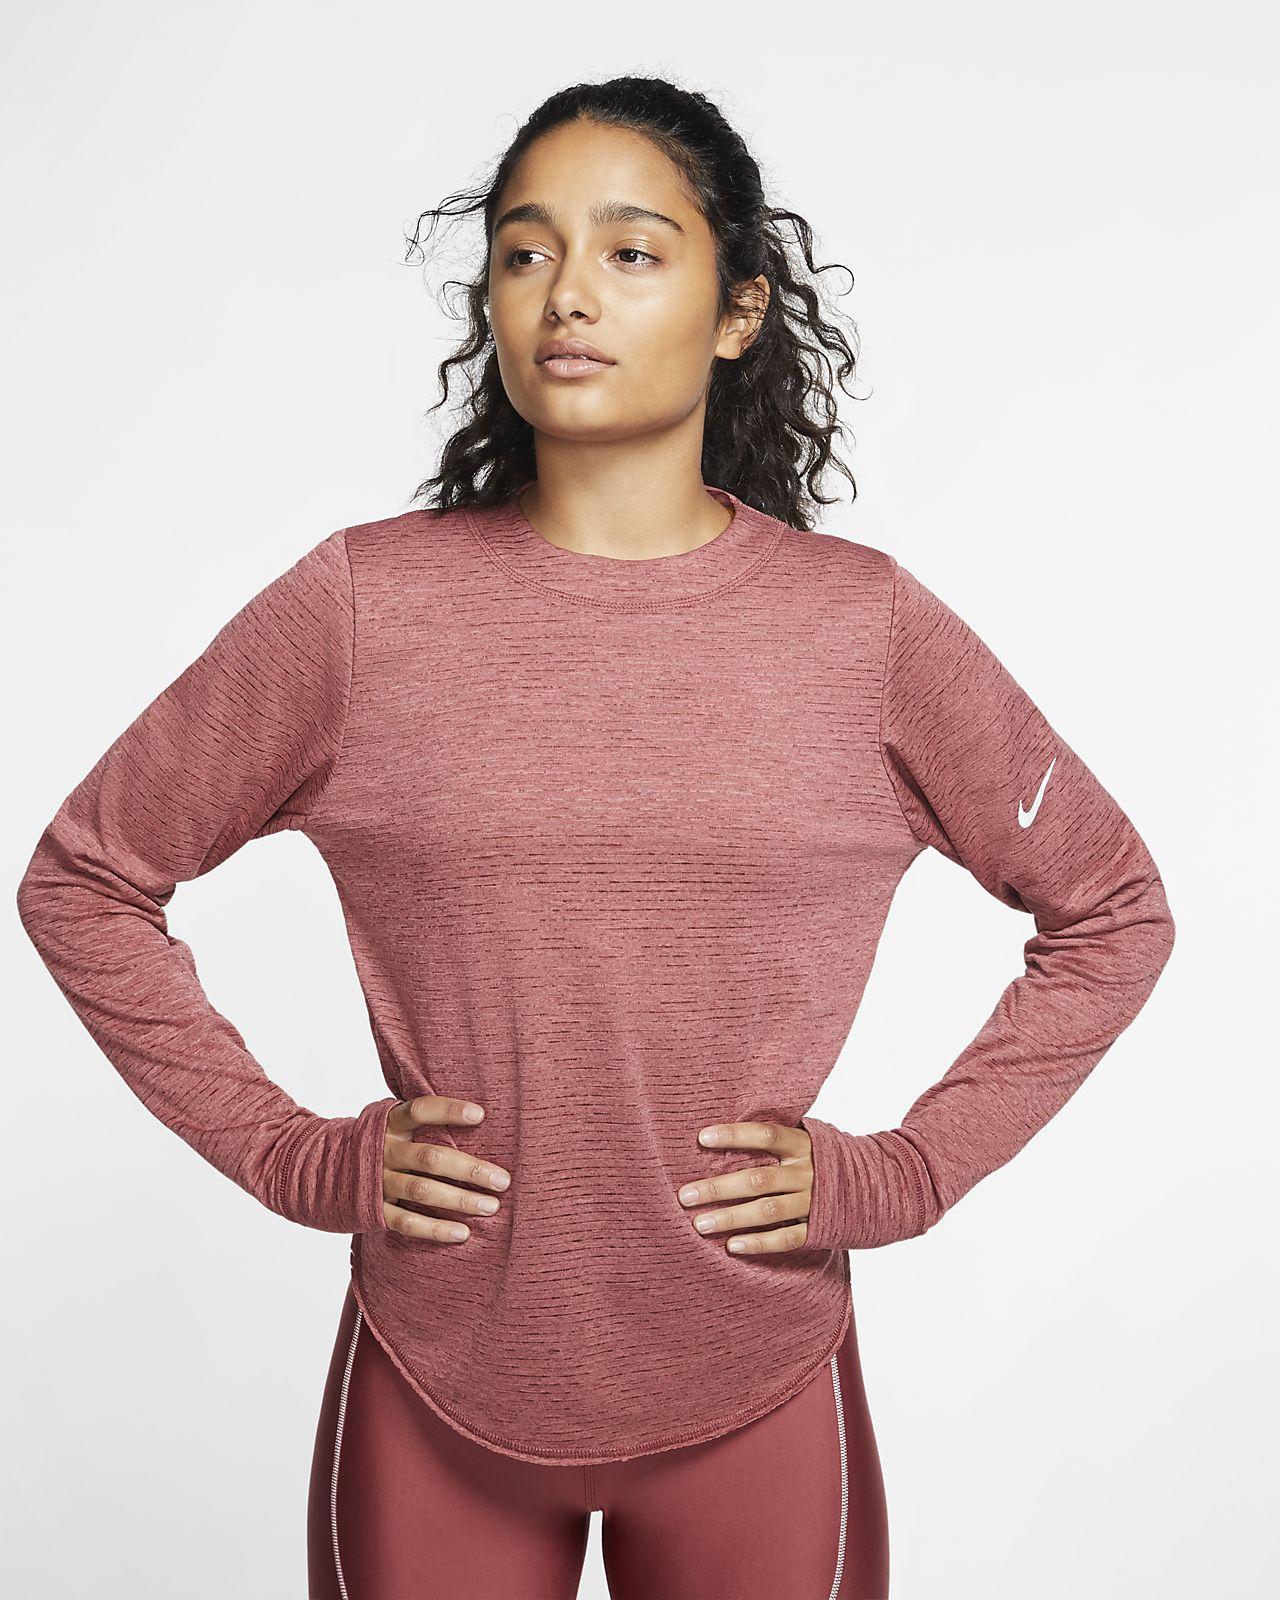 Prenda para la parte superior de running de manga larga para mujer Nike Sphere Element